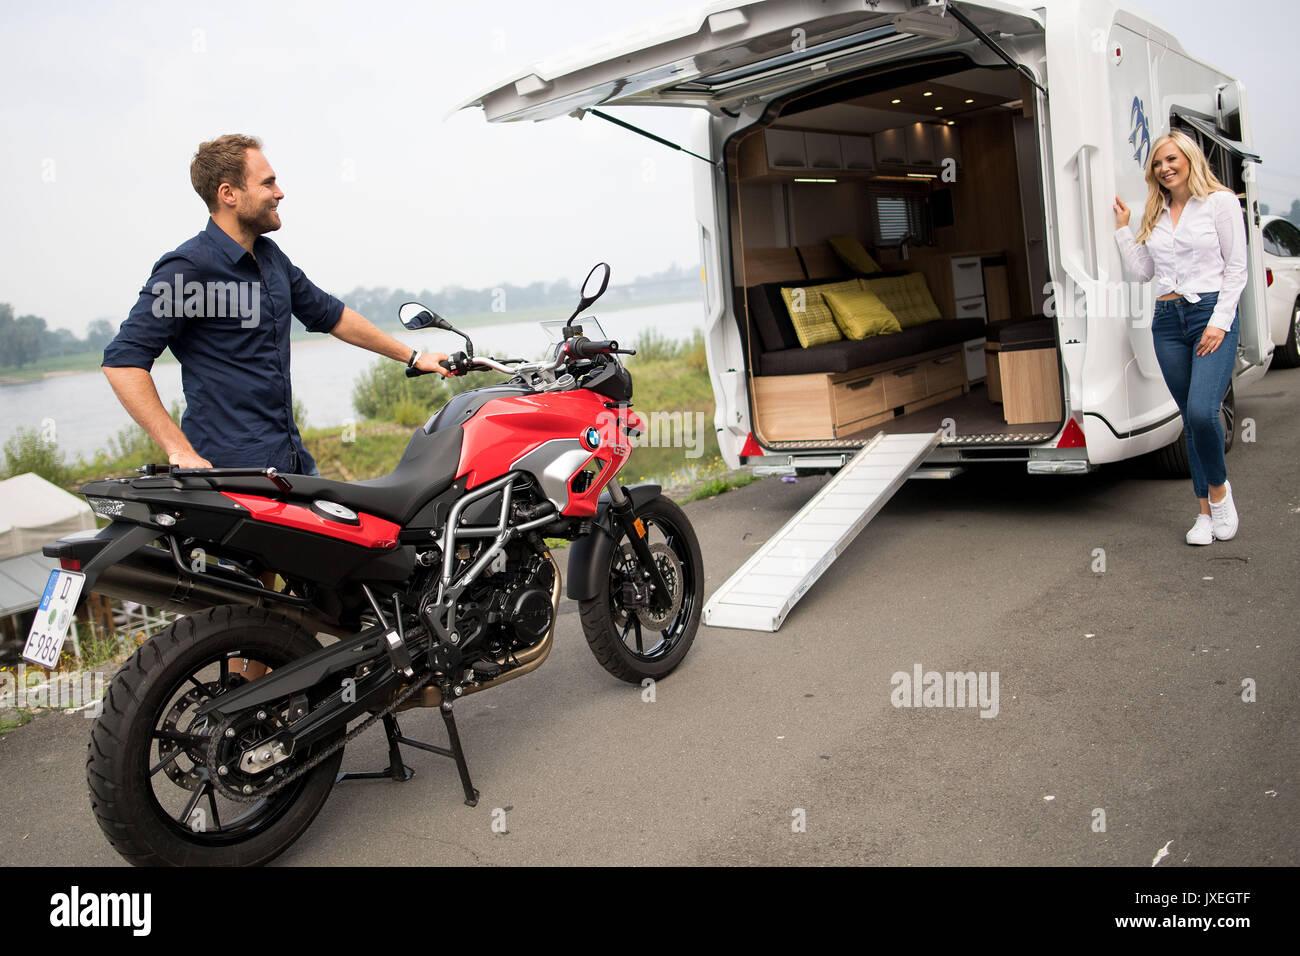 trade caravan stockfotos trade caravan bilder alamy. Black Bedroom Furniture Sets. Home Design Ideas